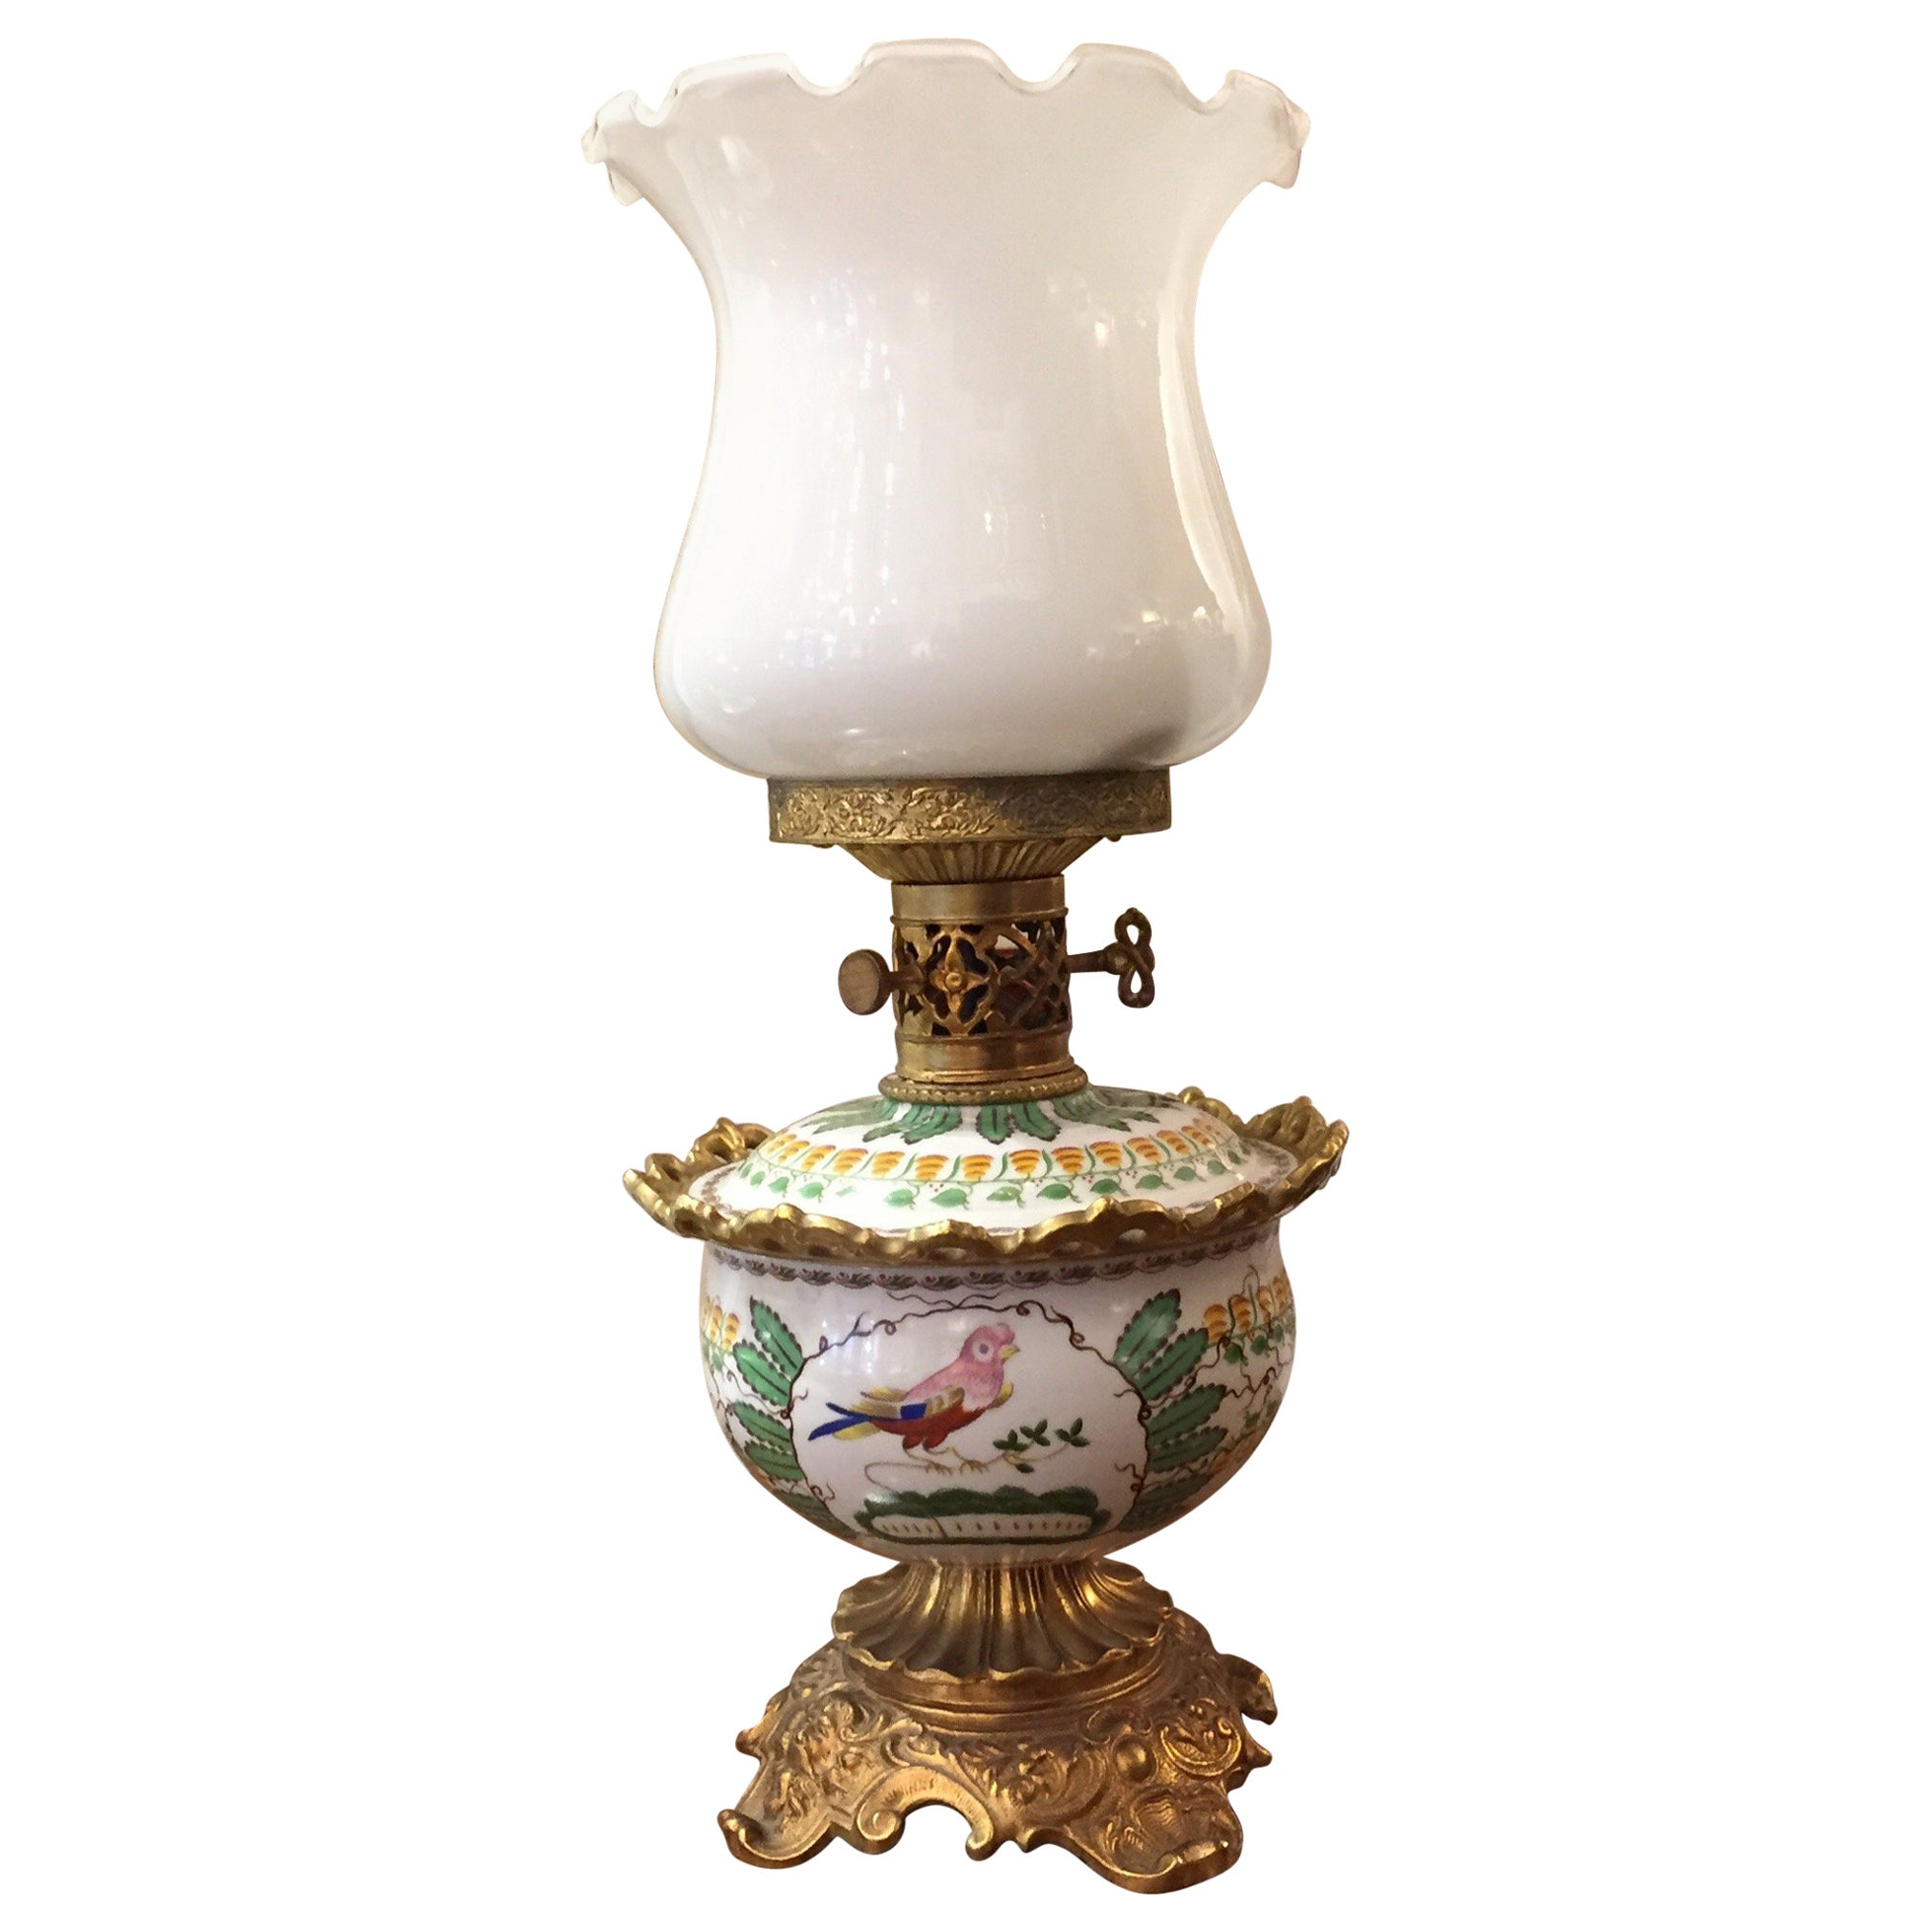 Italian Glass Ormolu Porcelain Table Oil Lamp by Mangani Firenze 1970